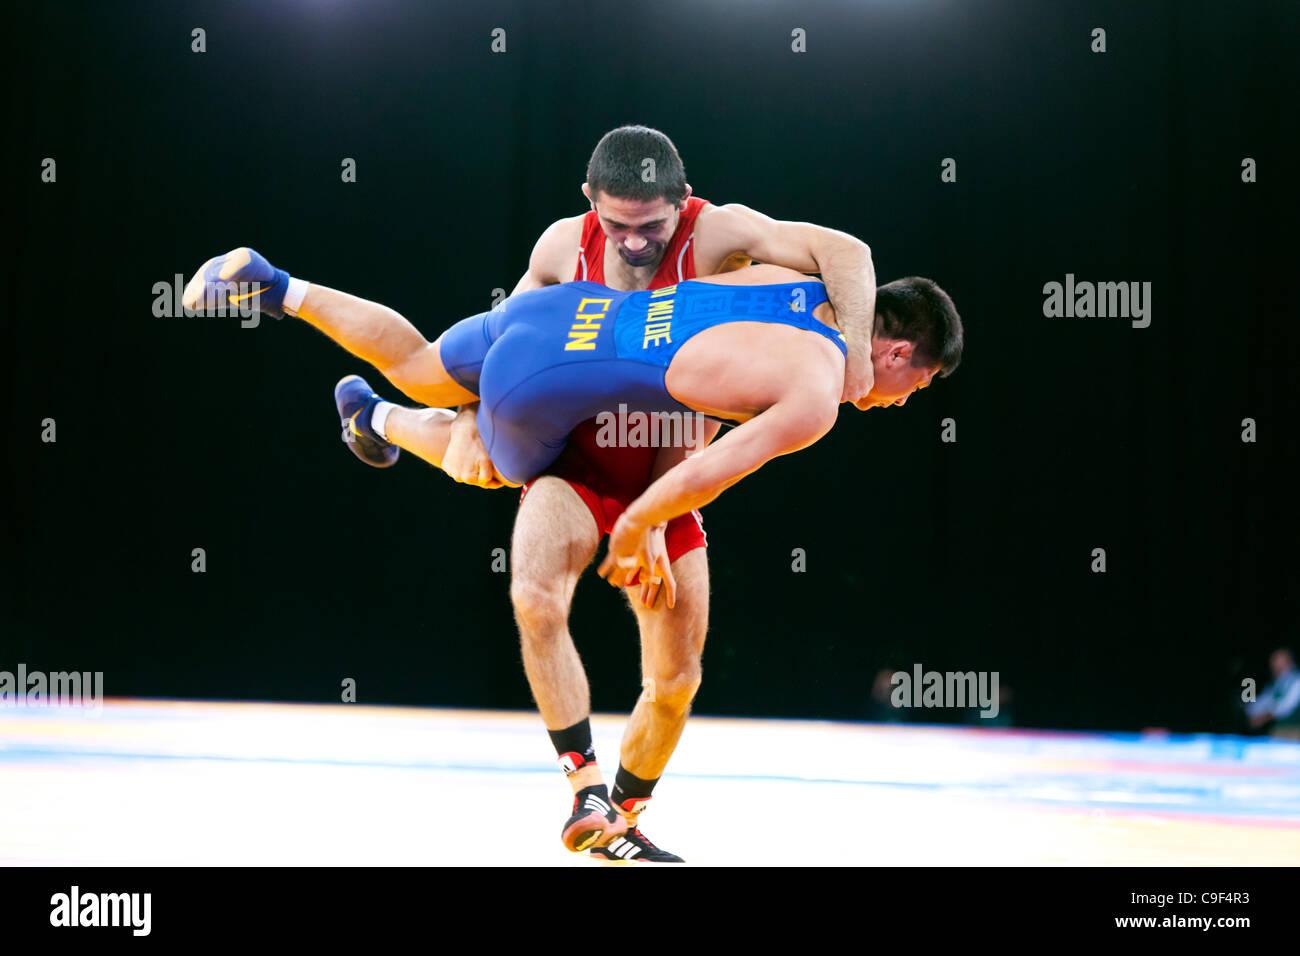 Qi mude de China v Karisimir KRASTANOV de Gran Bretaña ganó la medalla de bronce en el hombre de 55 kg Imagen De Stock